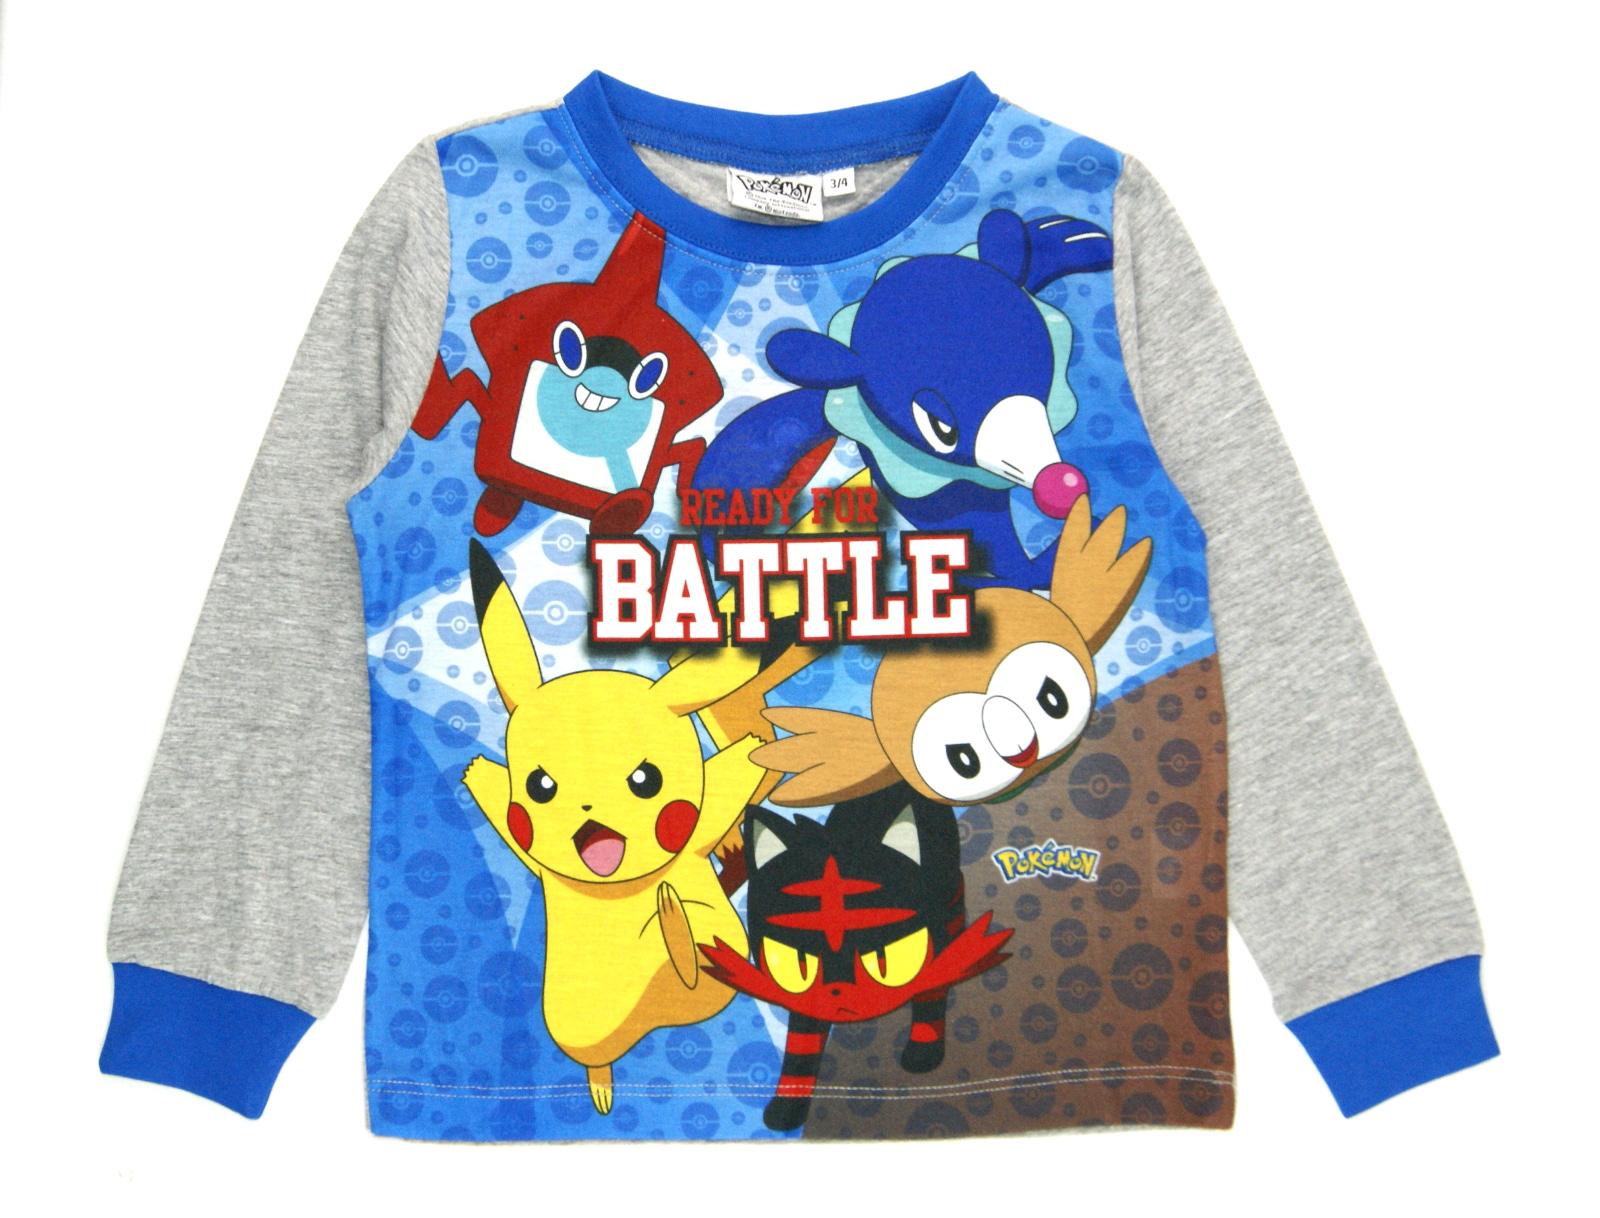 6d035a44fe Boys Pokemon Go Pyjamas Full Length Pikachu Pjs 2 Piece Pyjama Set ...